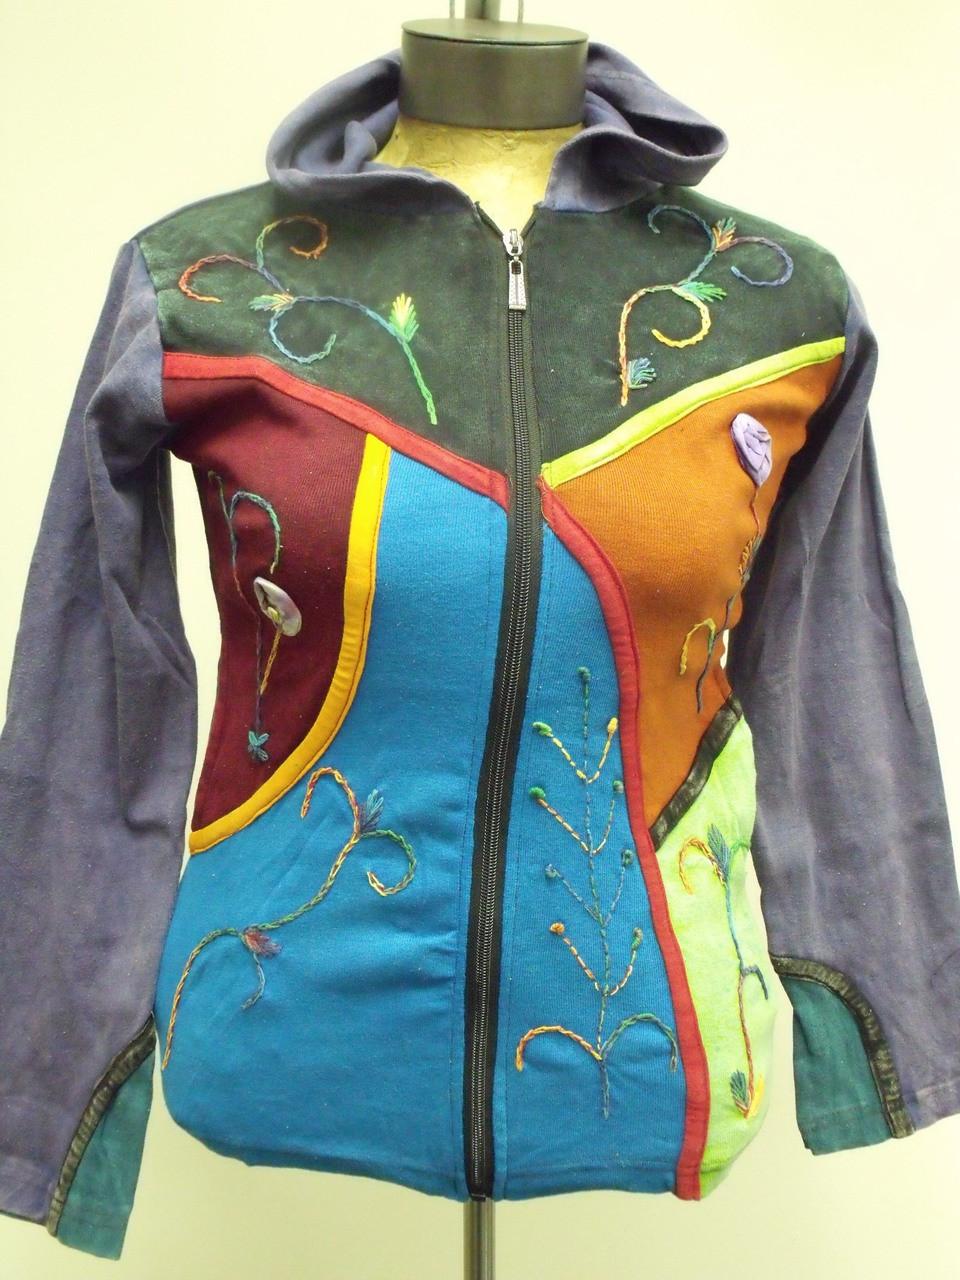 Nepal Hoodies Jacket Atj J46 R All That Jazz Online